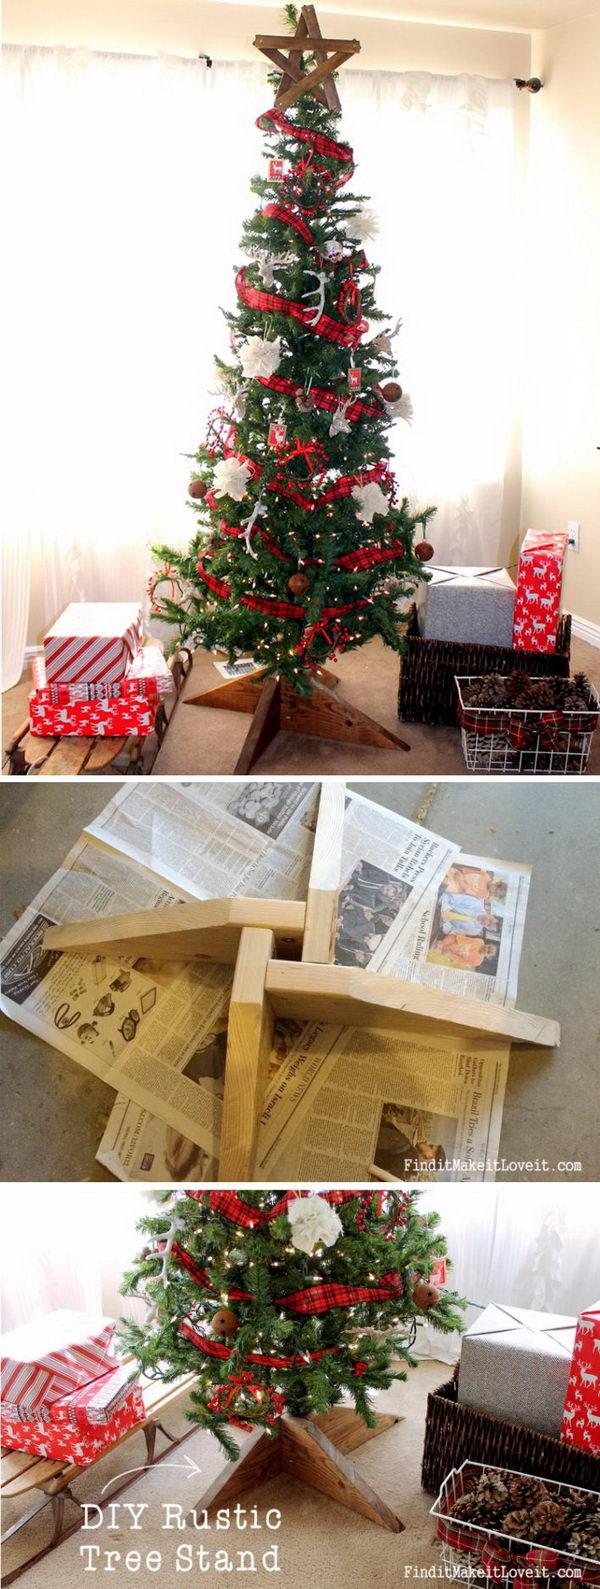 DIY Rustic Wood Tree Stand.